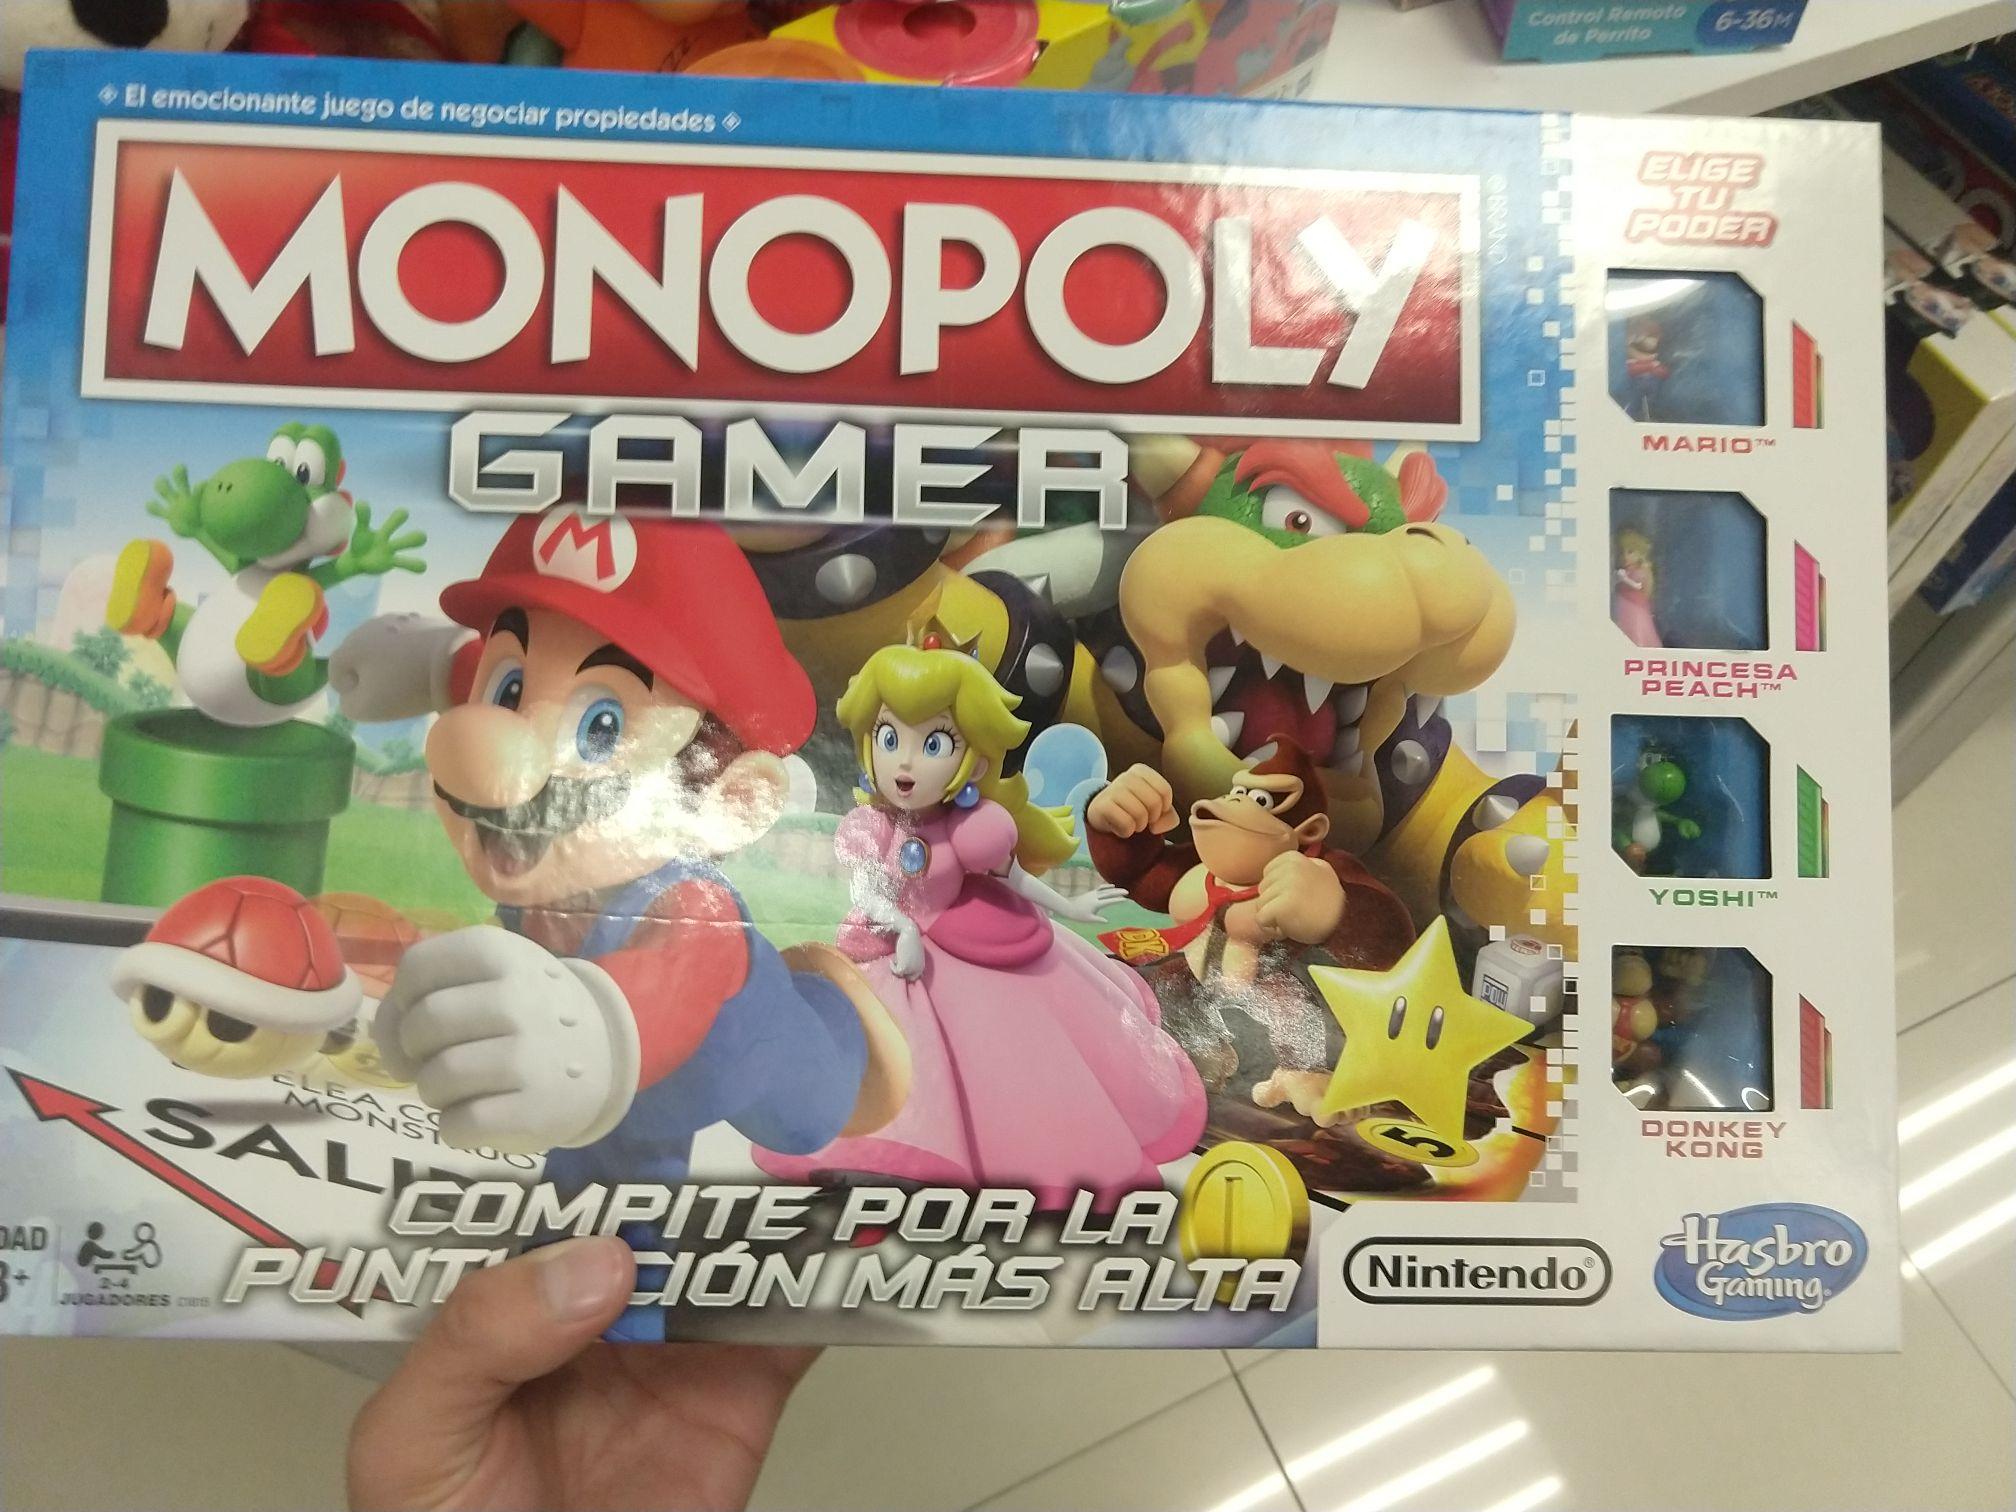 Suburbia Plaza Oriente: Monopoly Mario Bros Gamer